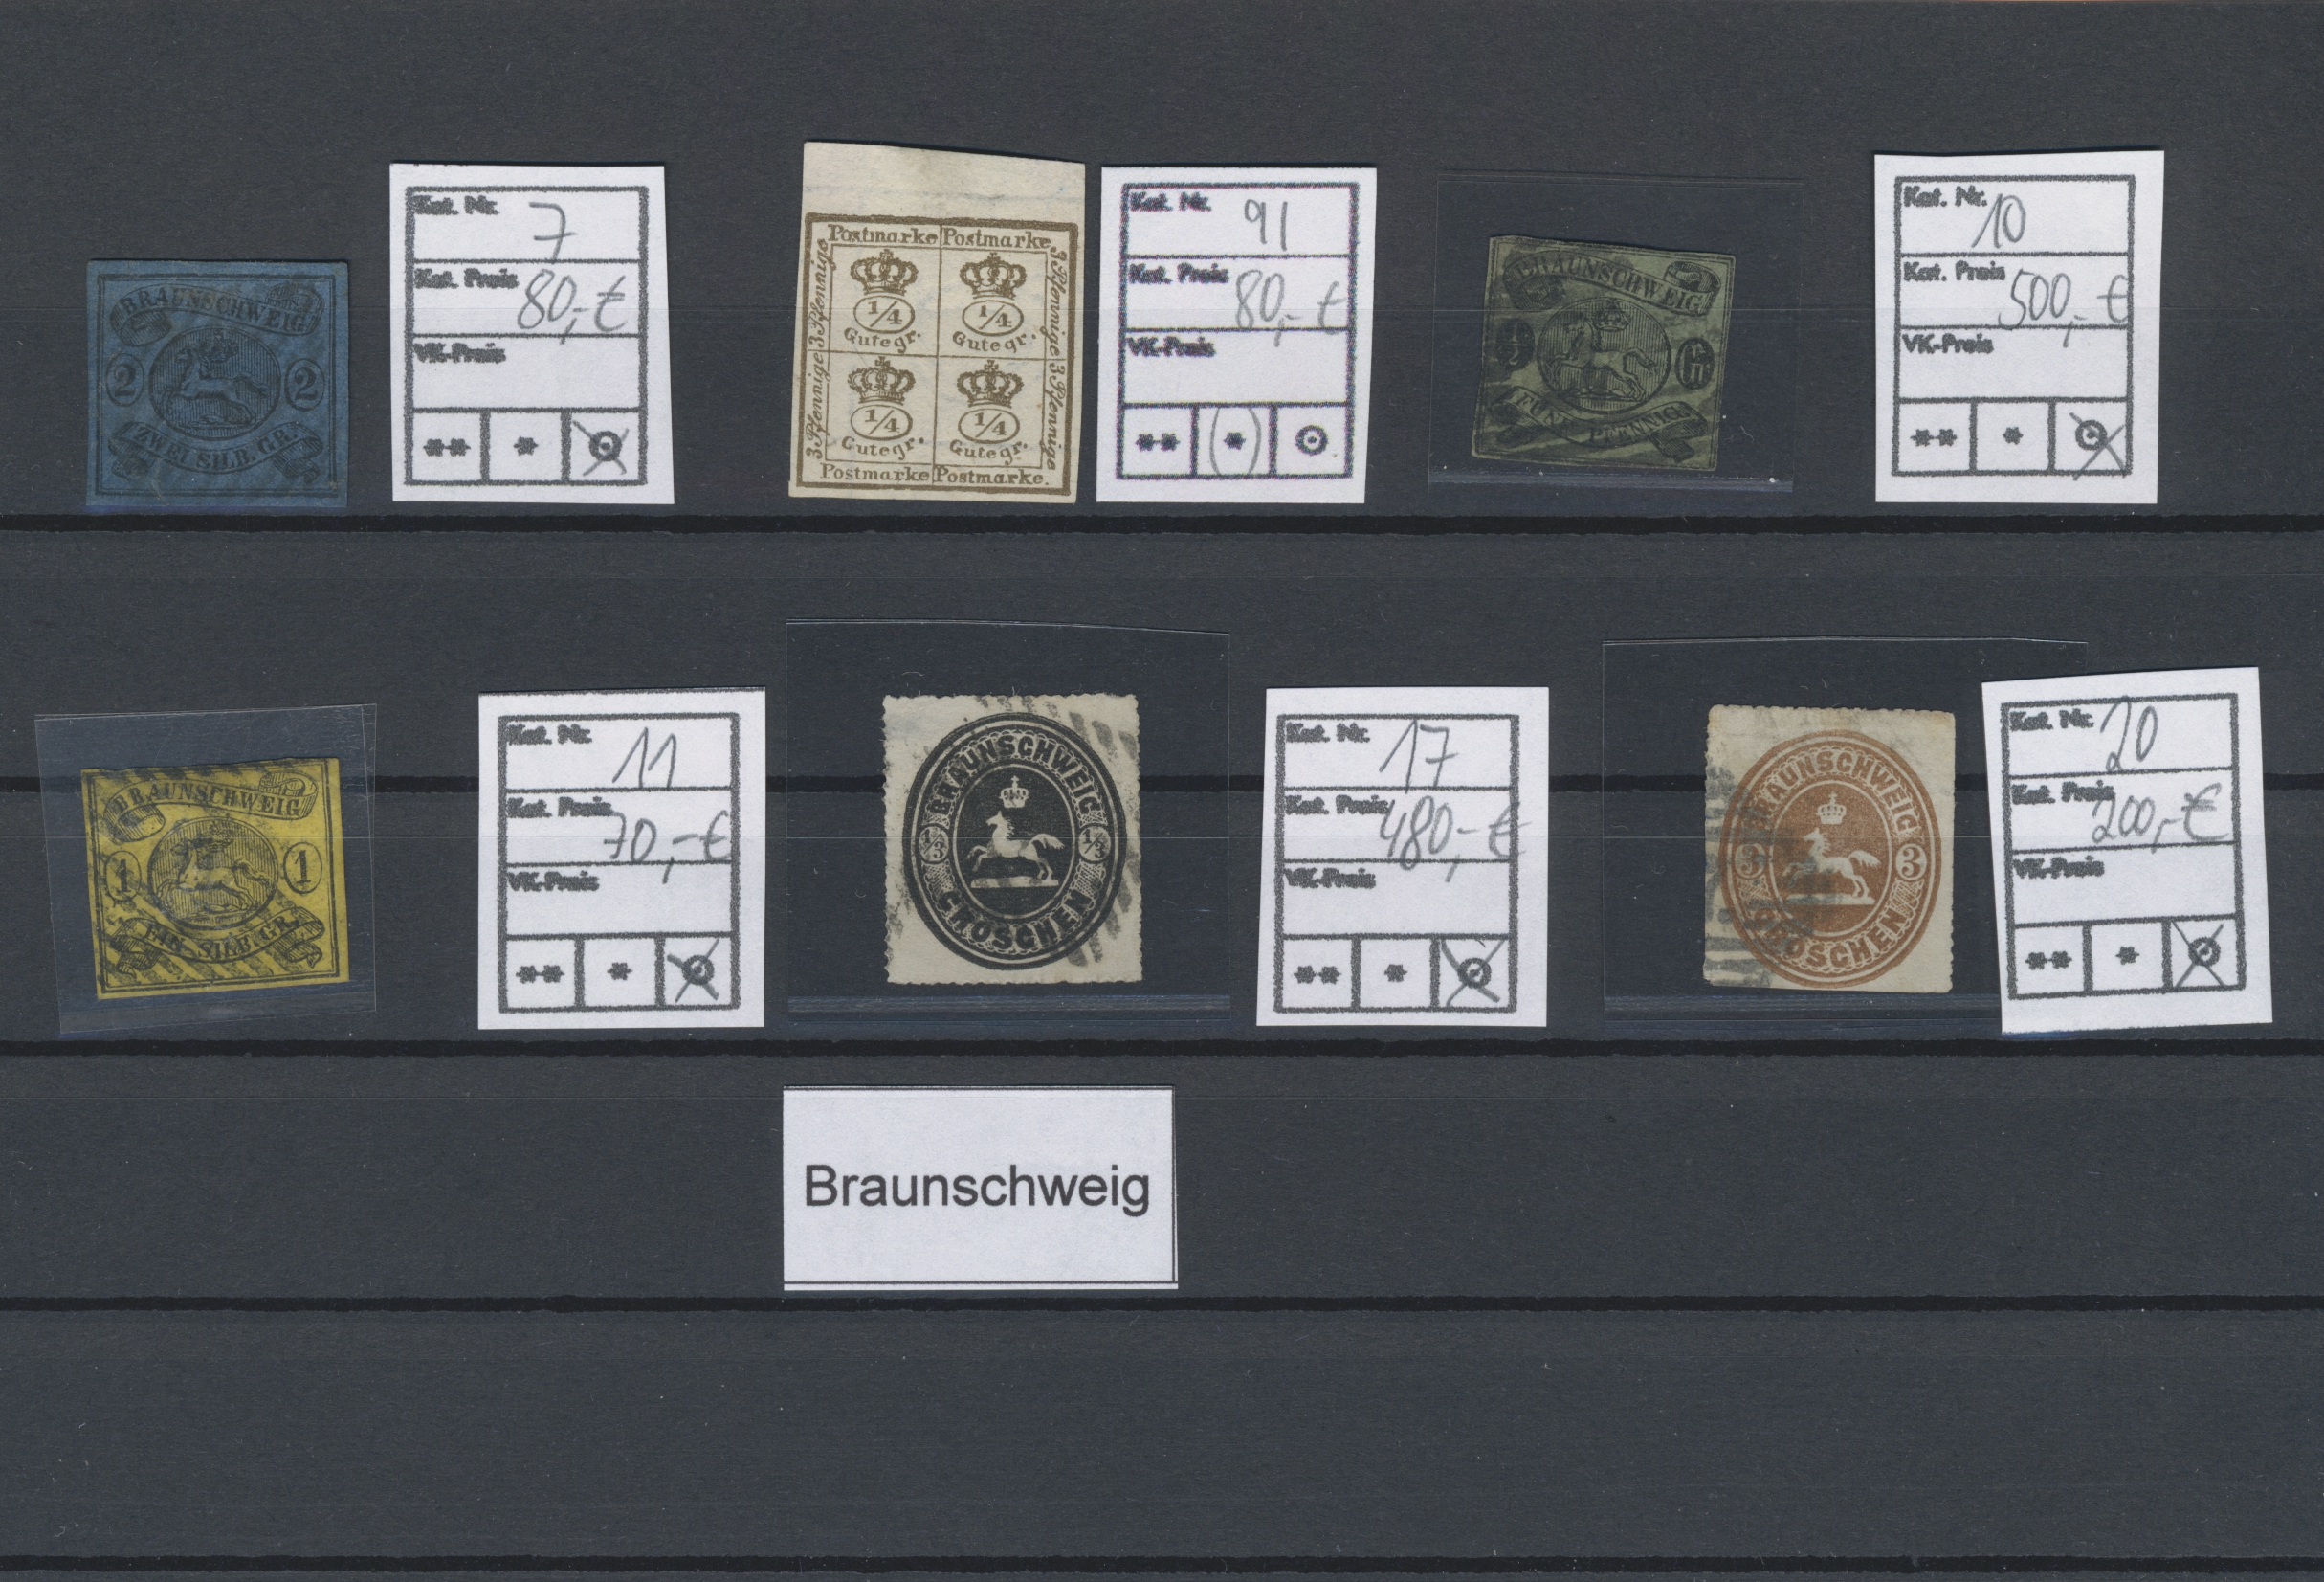 Lot 13001 - nachlässe  -  Auktionshaus Christoph Gärtner GmbH & Co. KG 51th Auction - Day 5